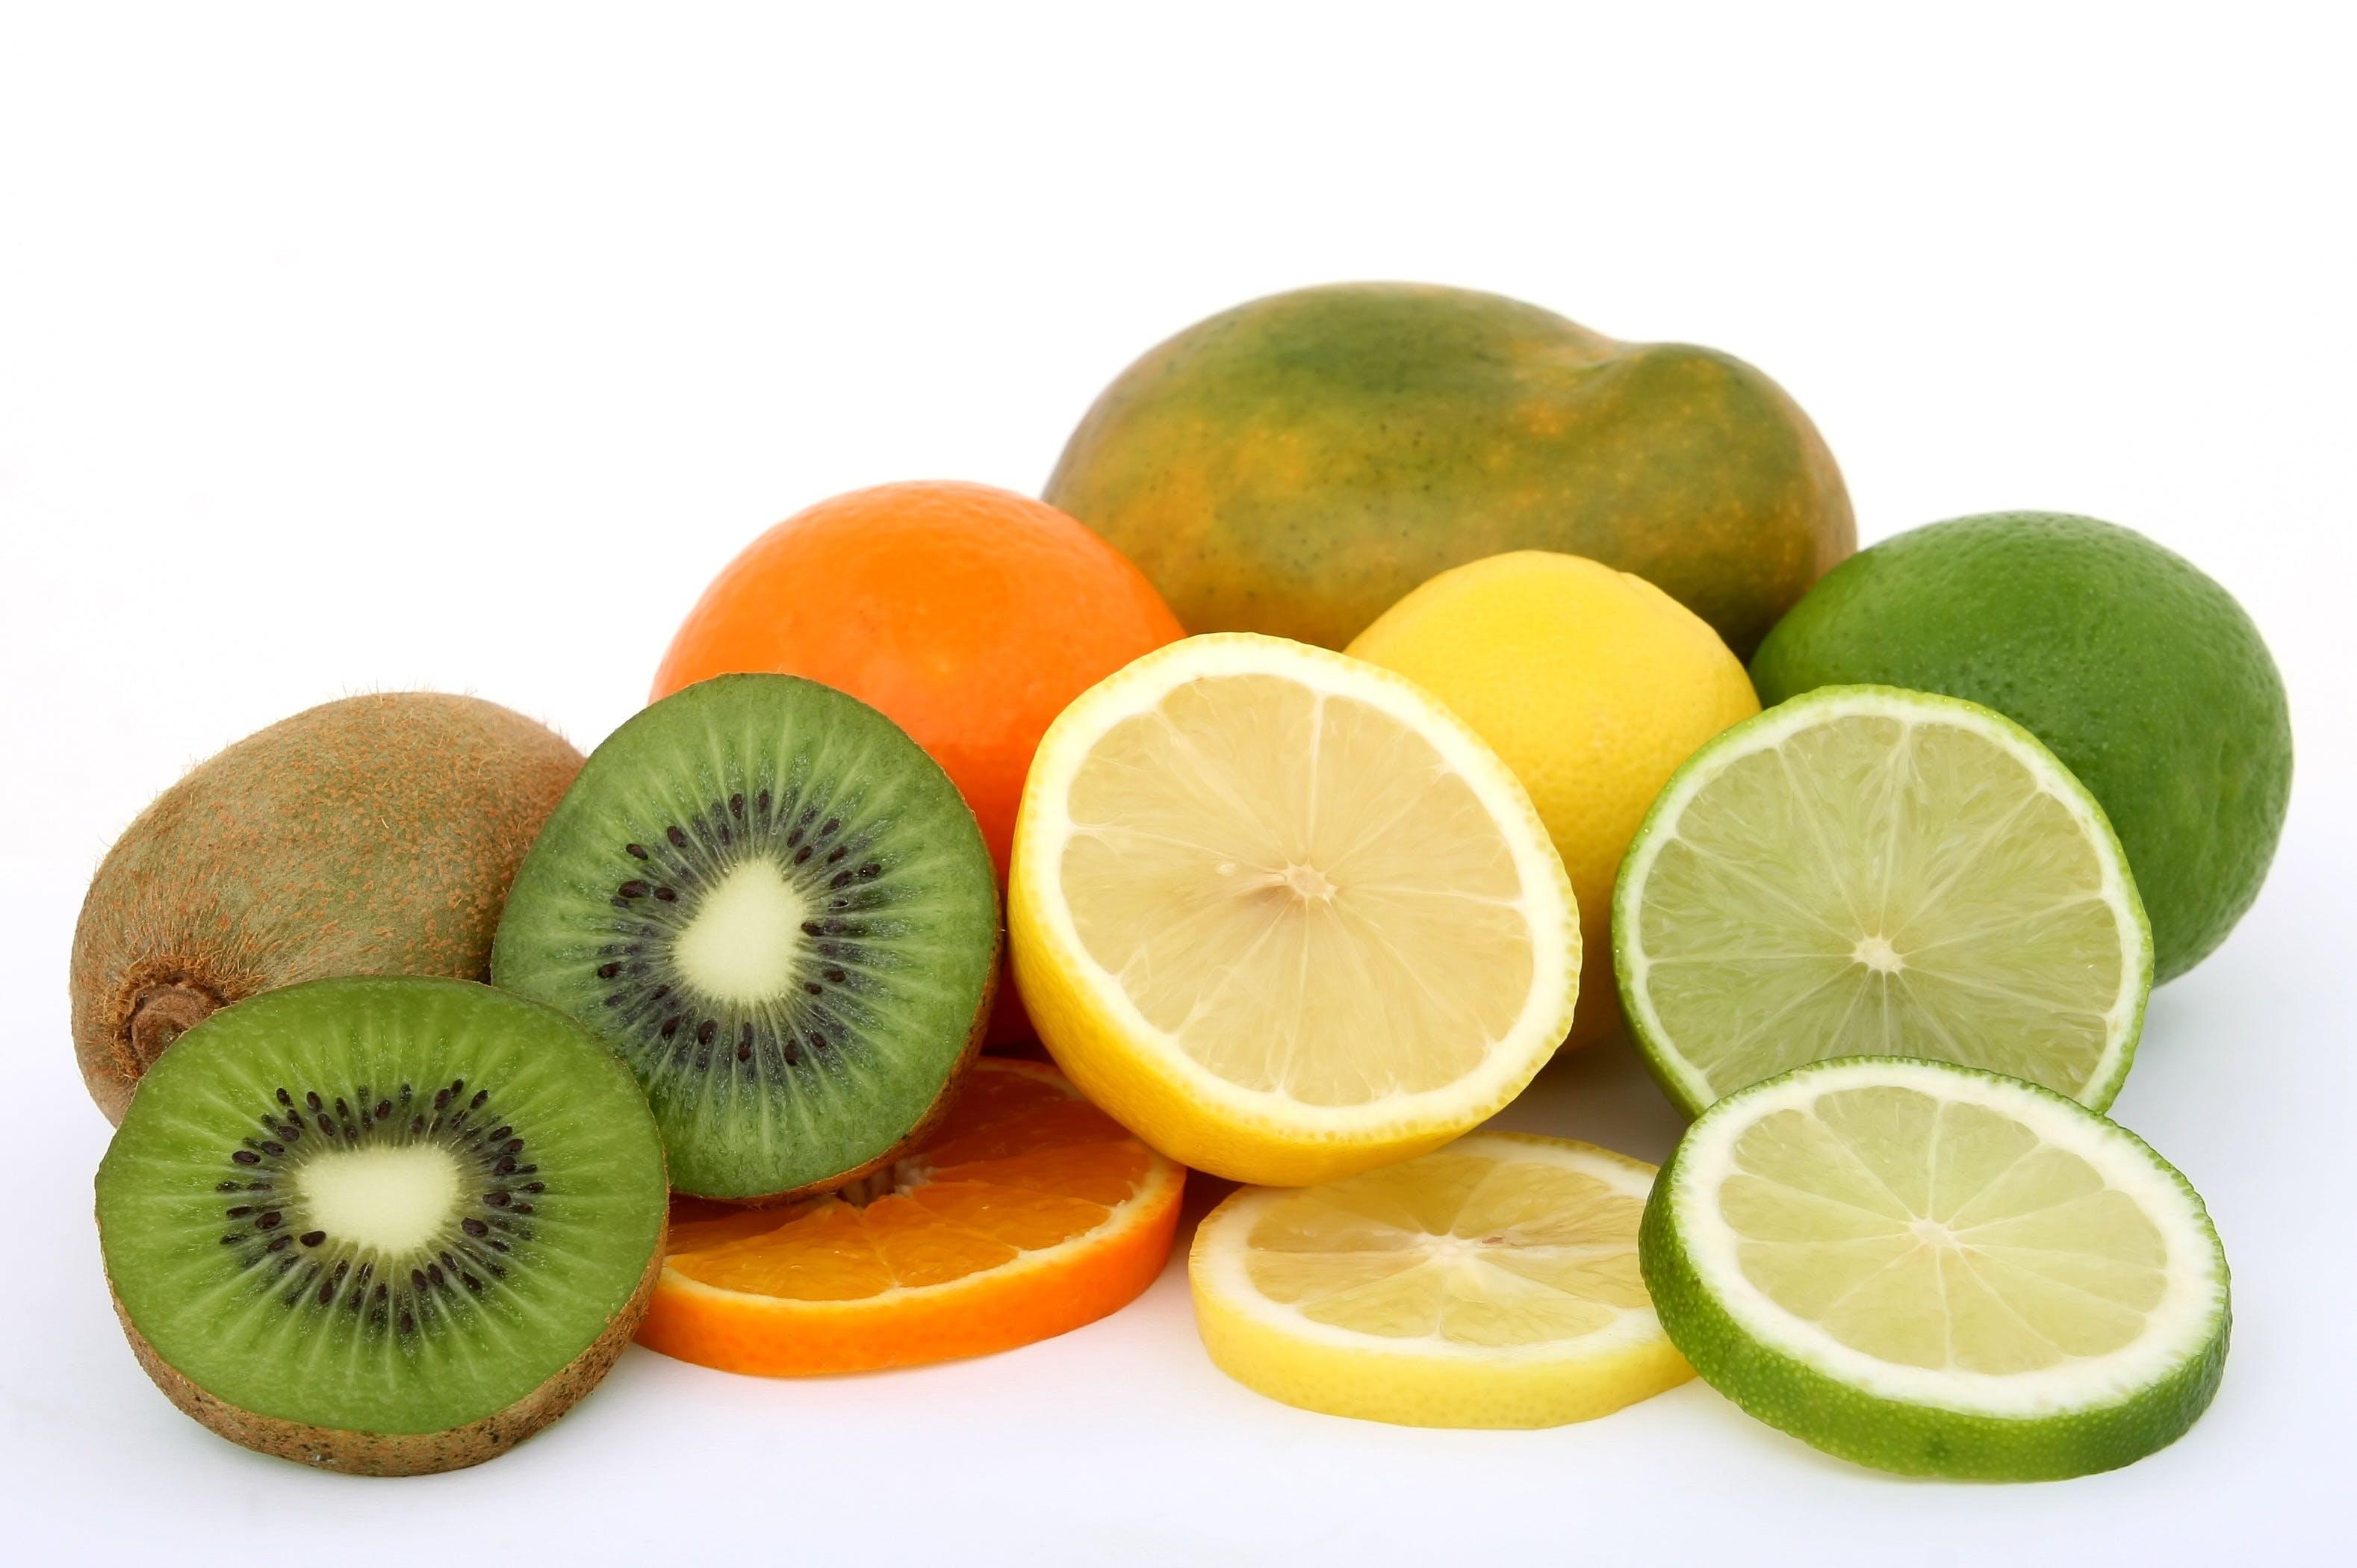 Gratis arkivbilde med appelsin, appelsiner, frukt, kiwi